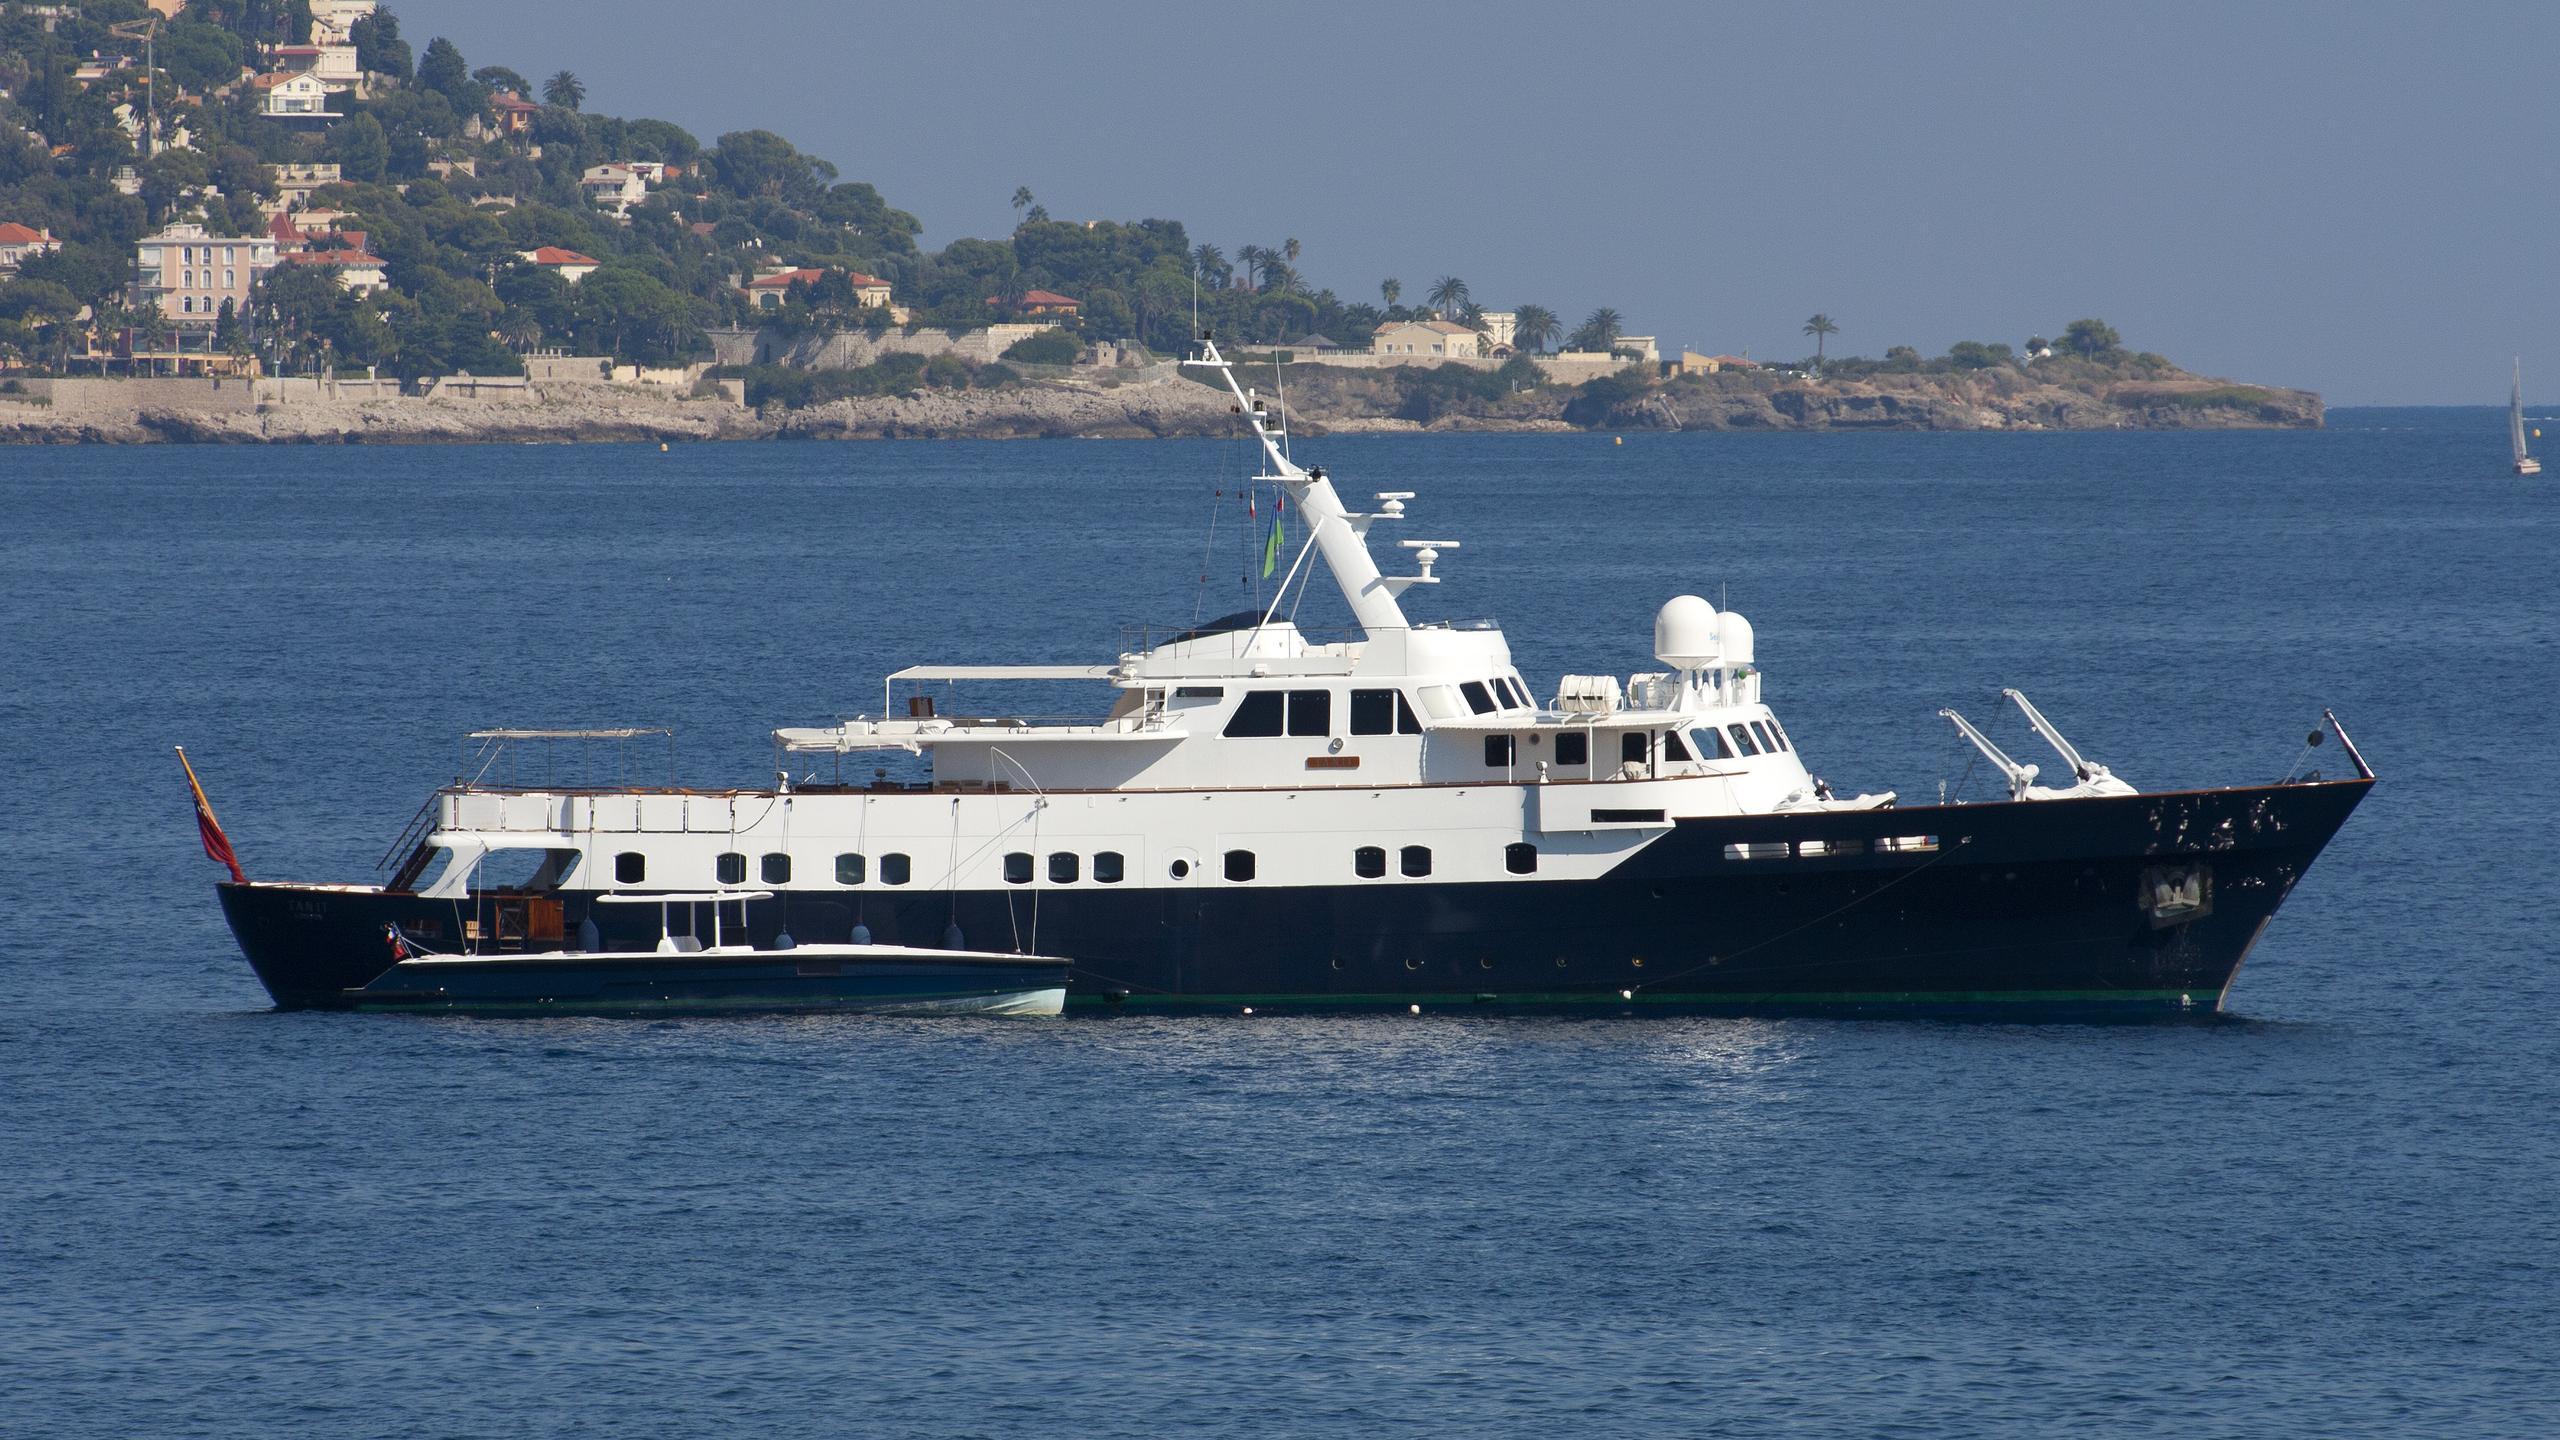 tanit-motor-yacht-camper-nicholsons-1967-46m-profile